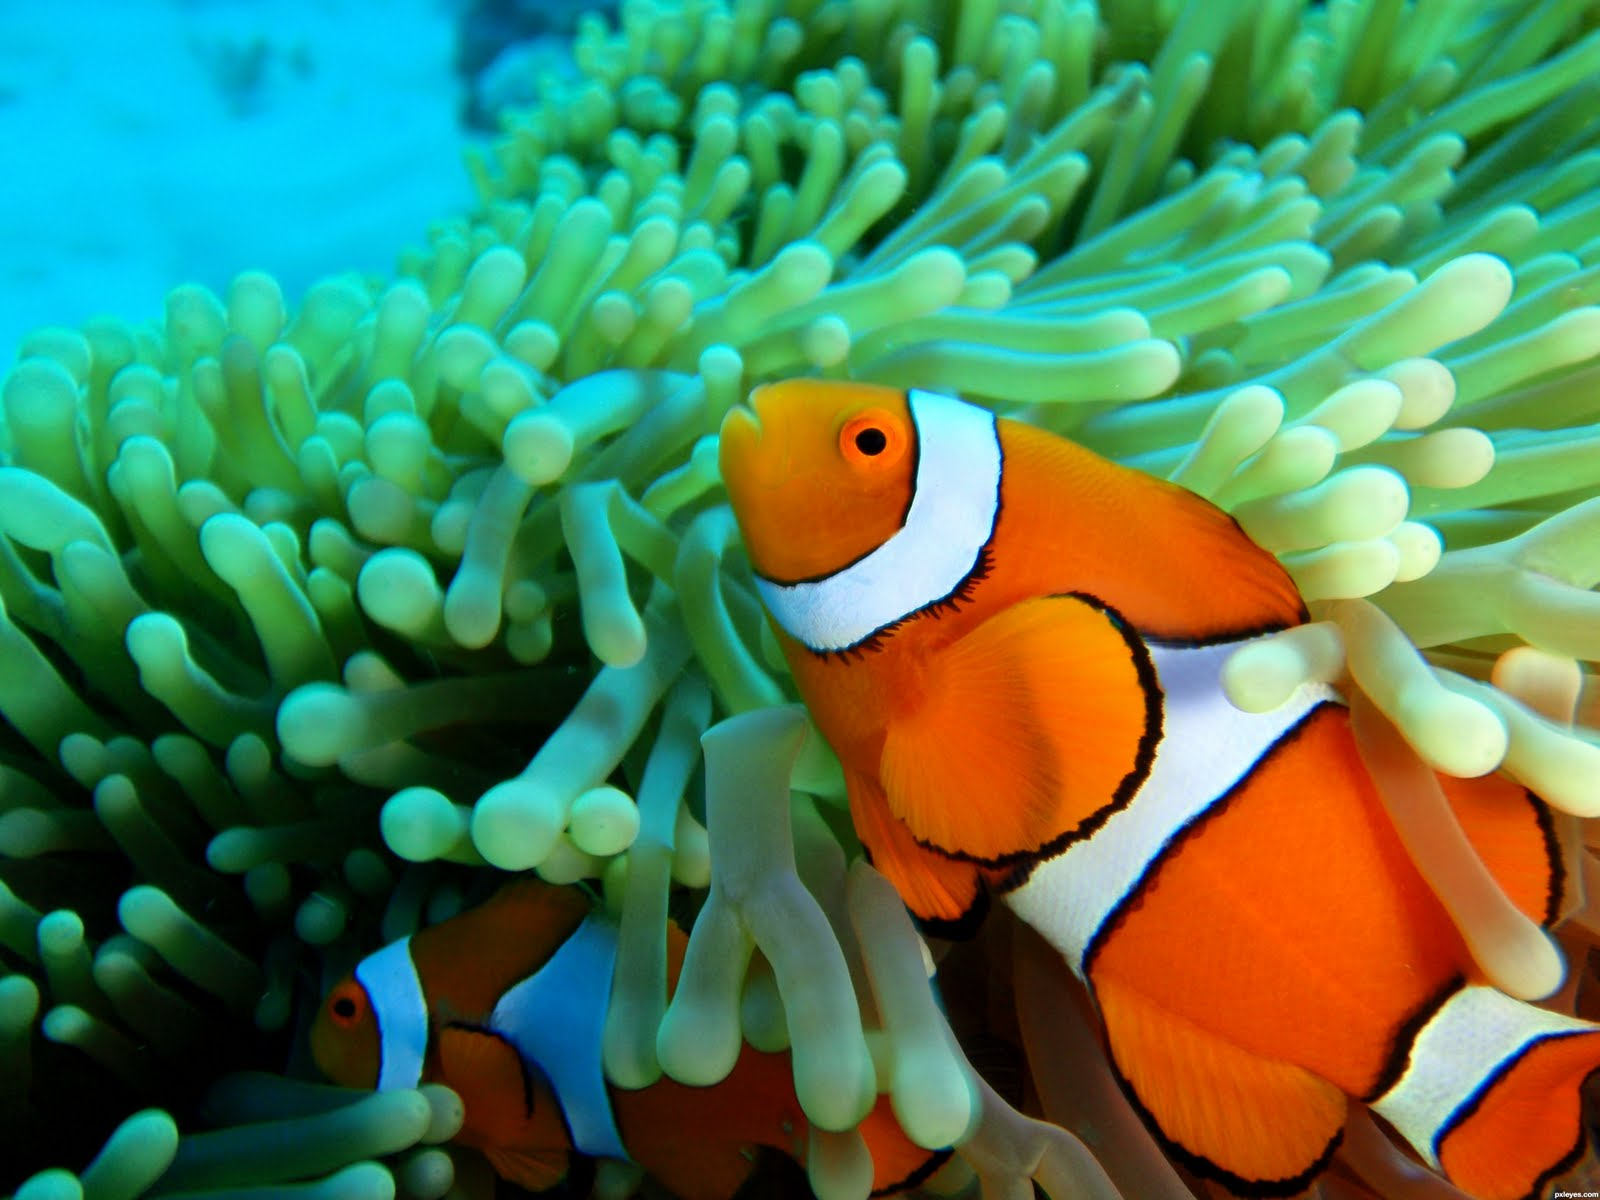 Finding Nemo D Animasi Hd Wallpaper: Clownfish / Ikan Badut / Ikan Nemo Wallpapers / Pictures